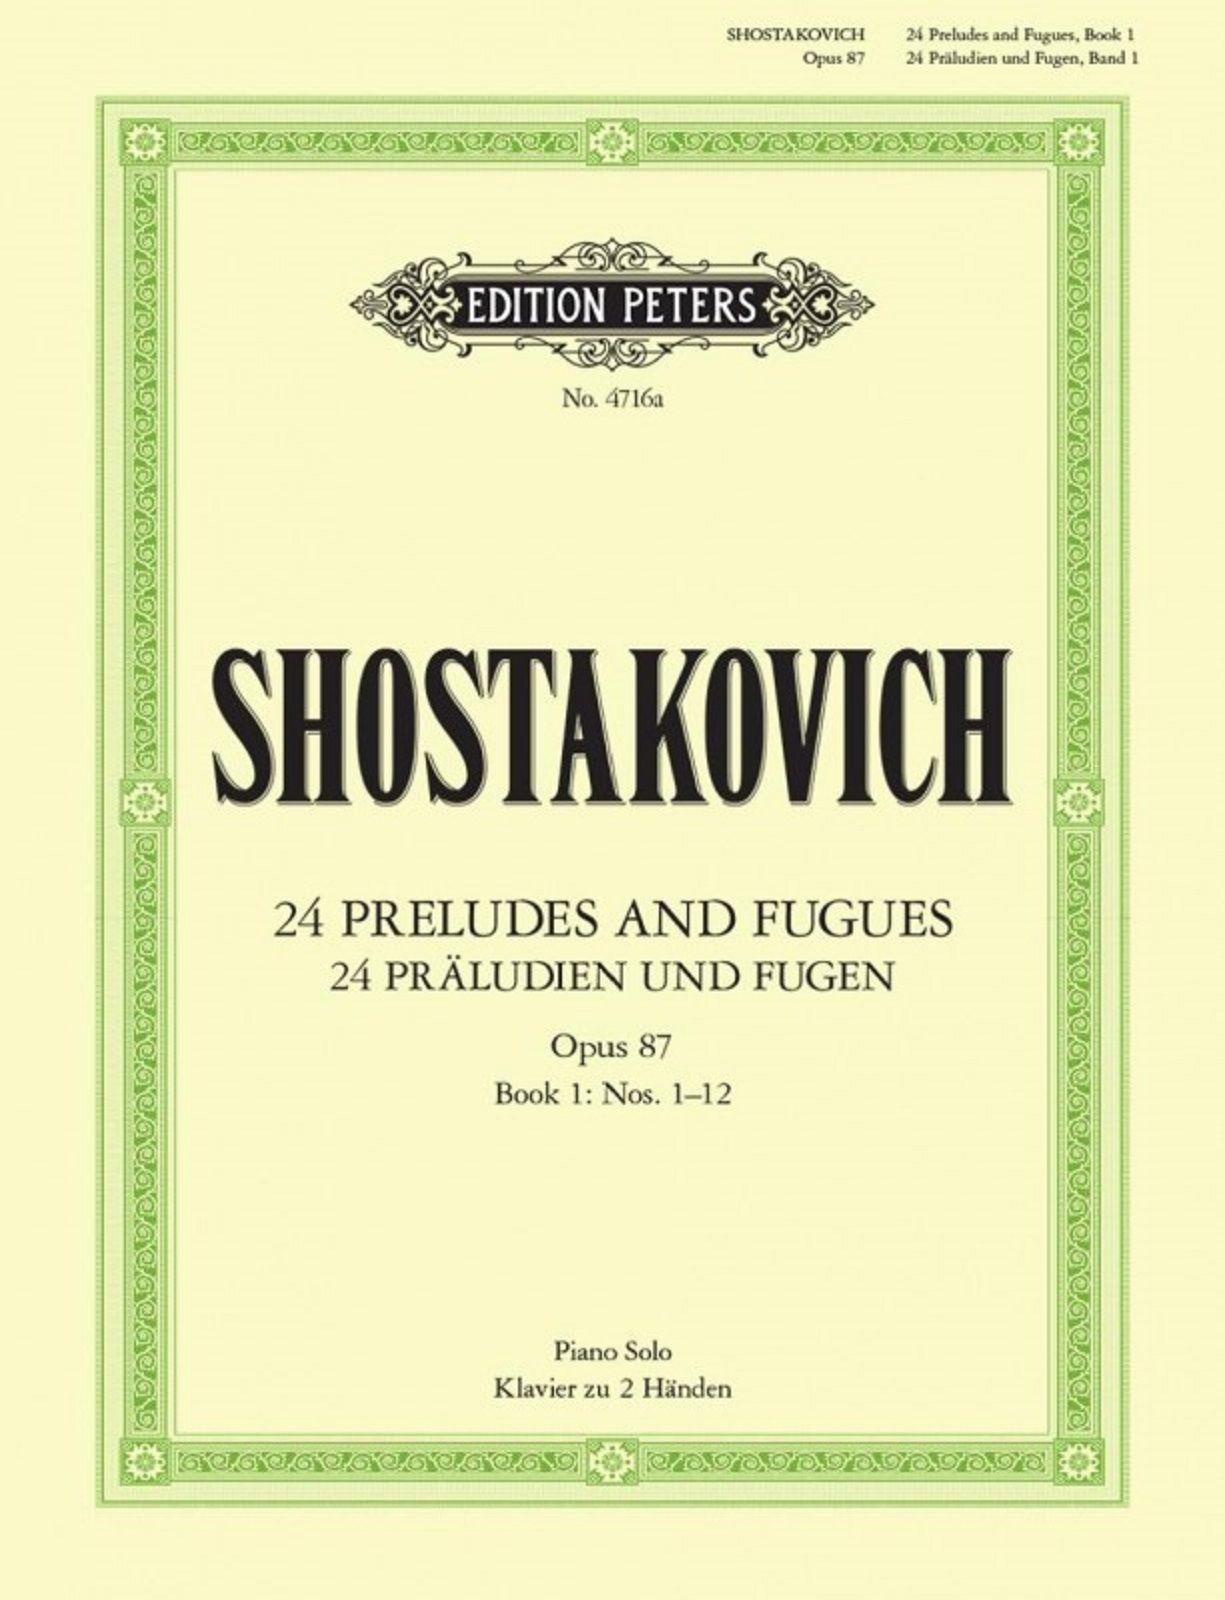 Shostakovich 24 Preludes & Fugues, Op.87 Sheet music